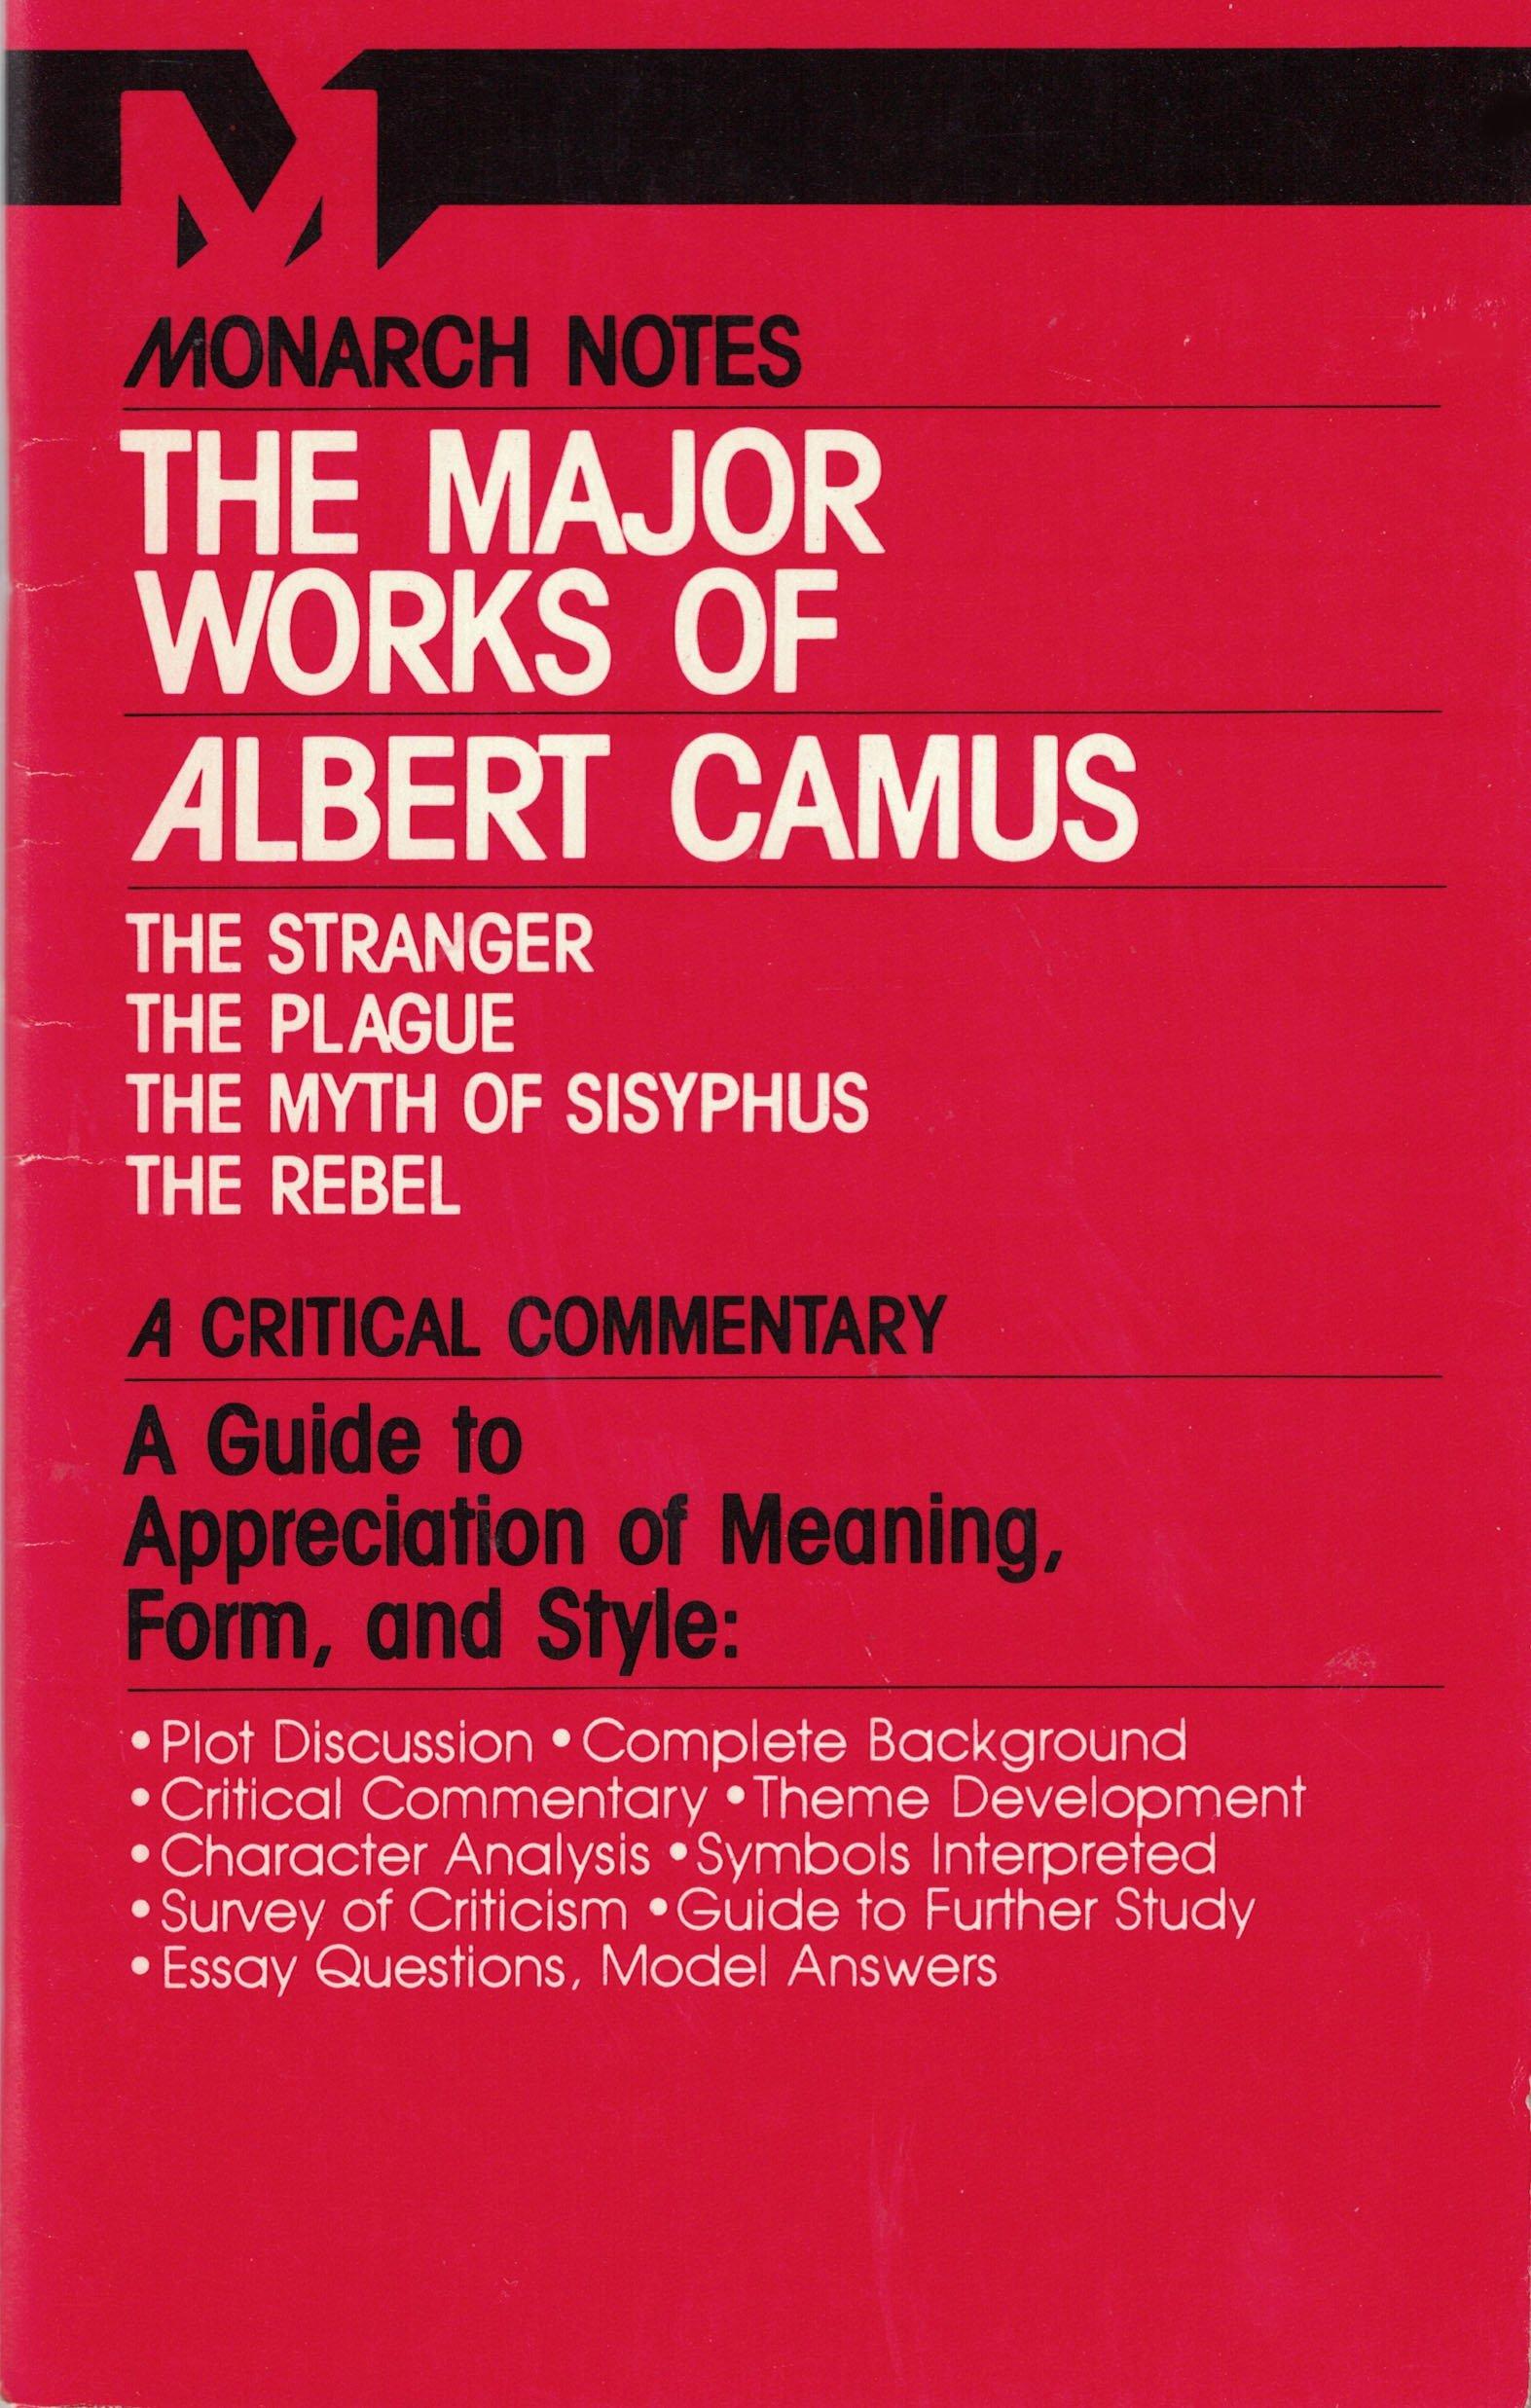 The Major Works Of Albert Camus Austin Fowler 9780671005528 Books